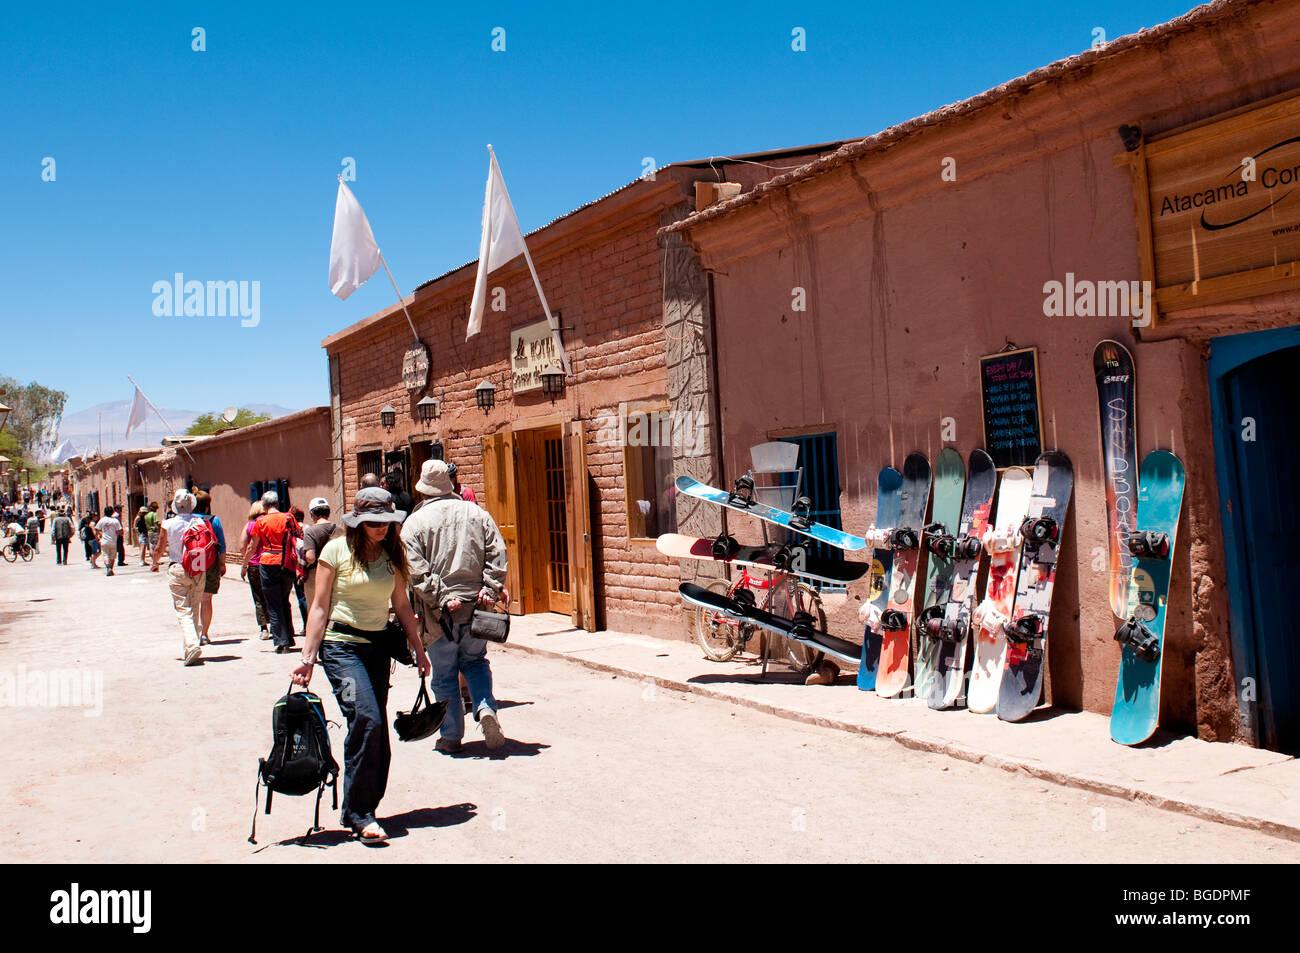 Caracoles Street In San Pedro de Atacama - Stock Image